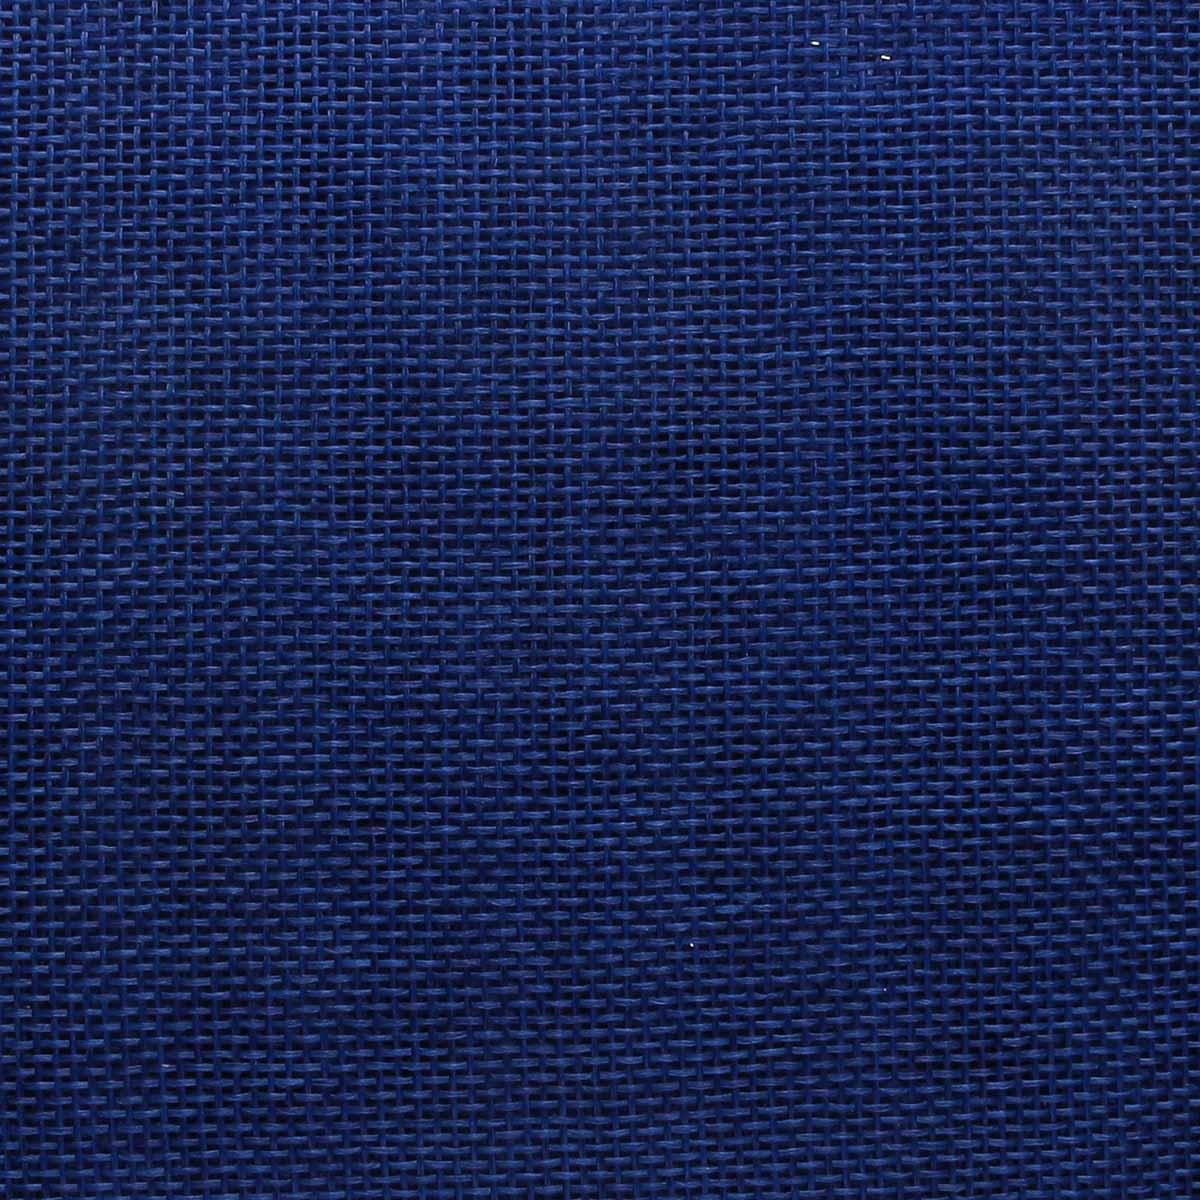 2AR111 Рогожка 100% полиэстер 48*50см (синий)